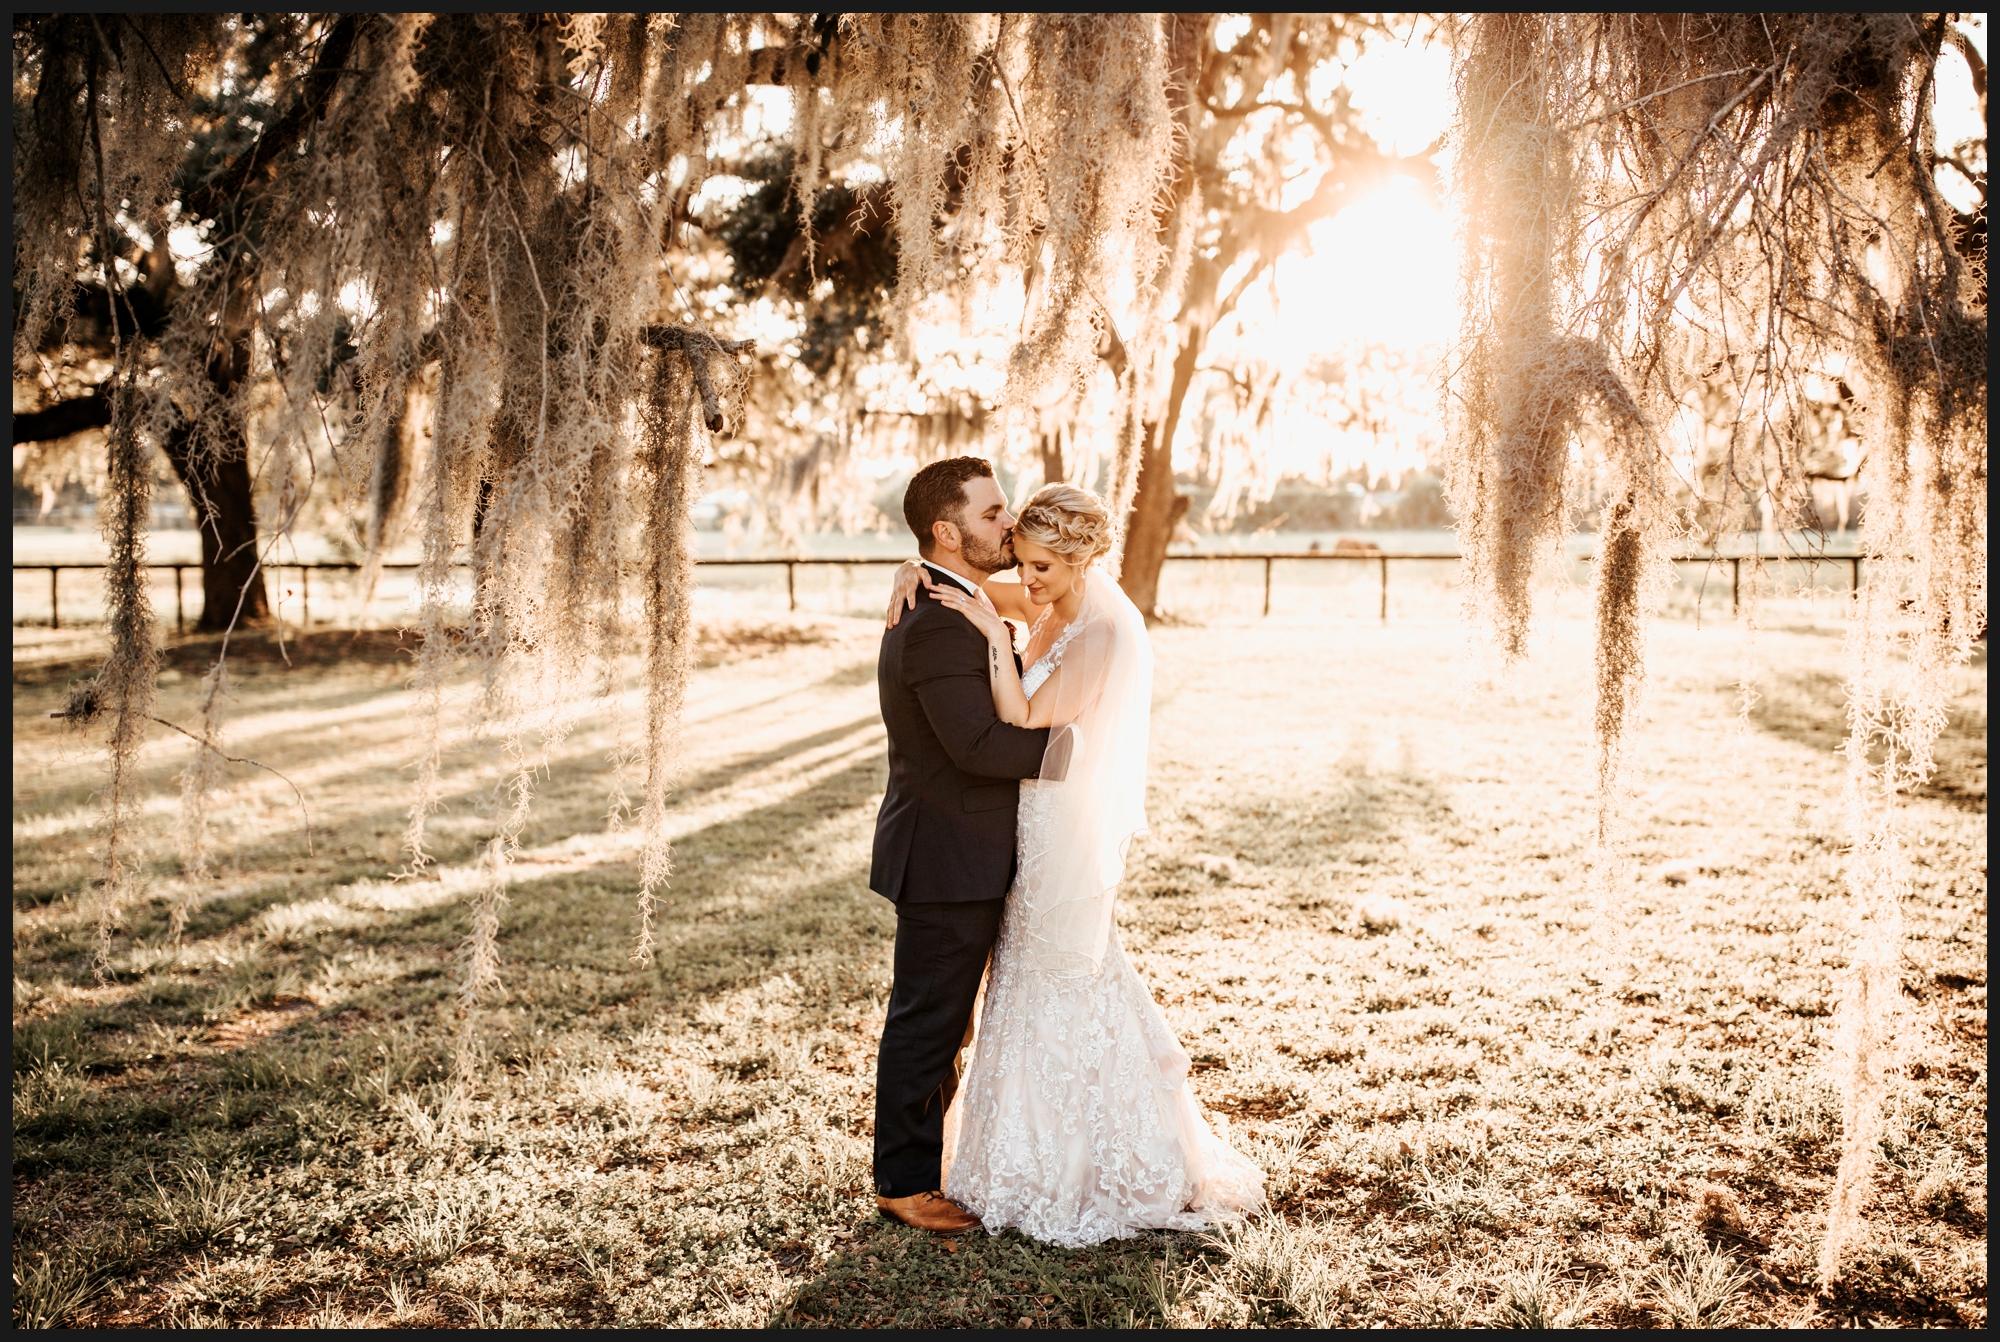 Orlando-Wedding-Photographer-destination-wedding-photographer-florida-wedding-photographer-hawaii-wedding-photographer_0612.jpg